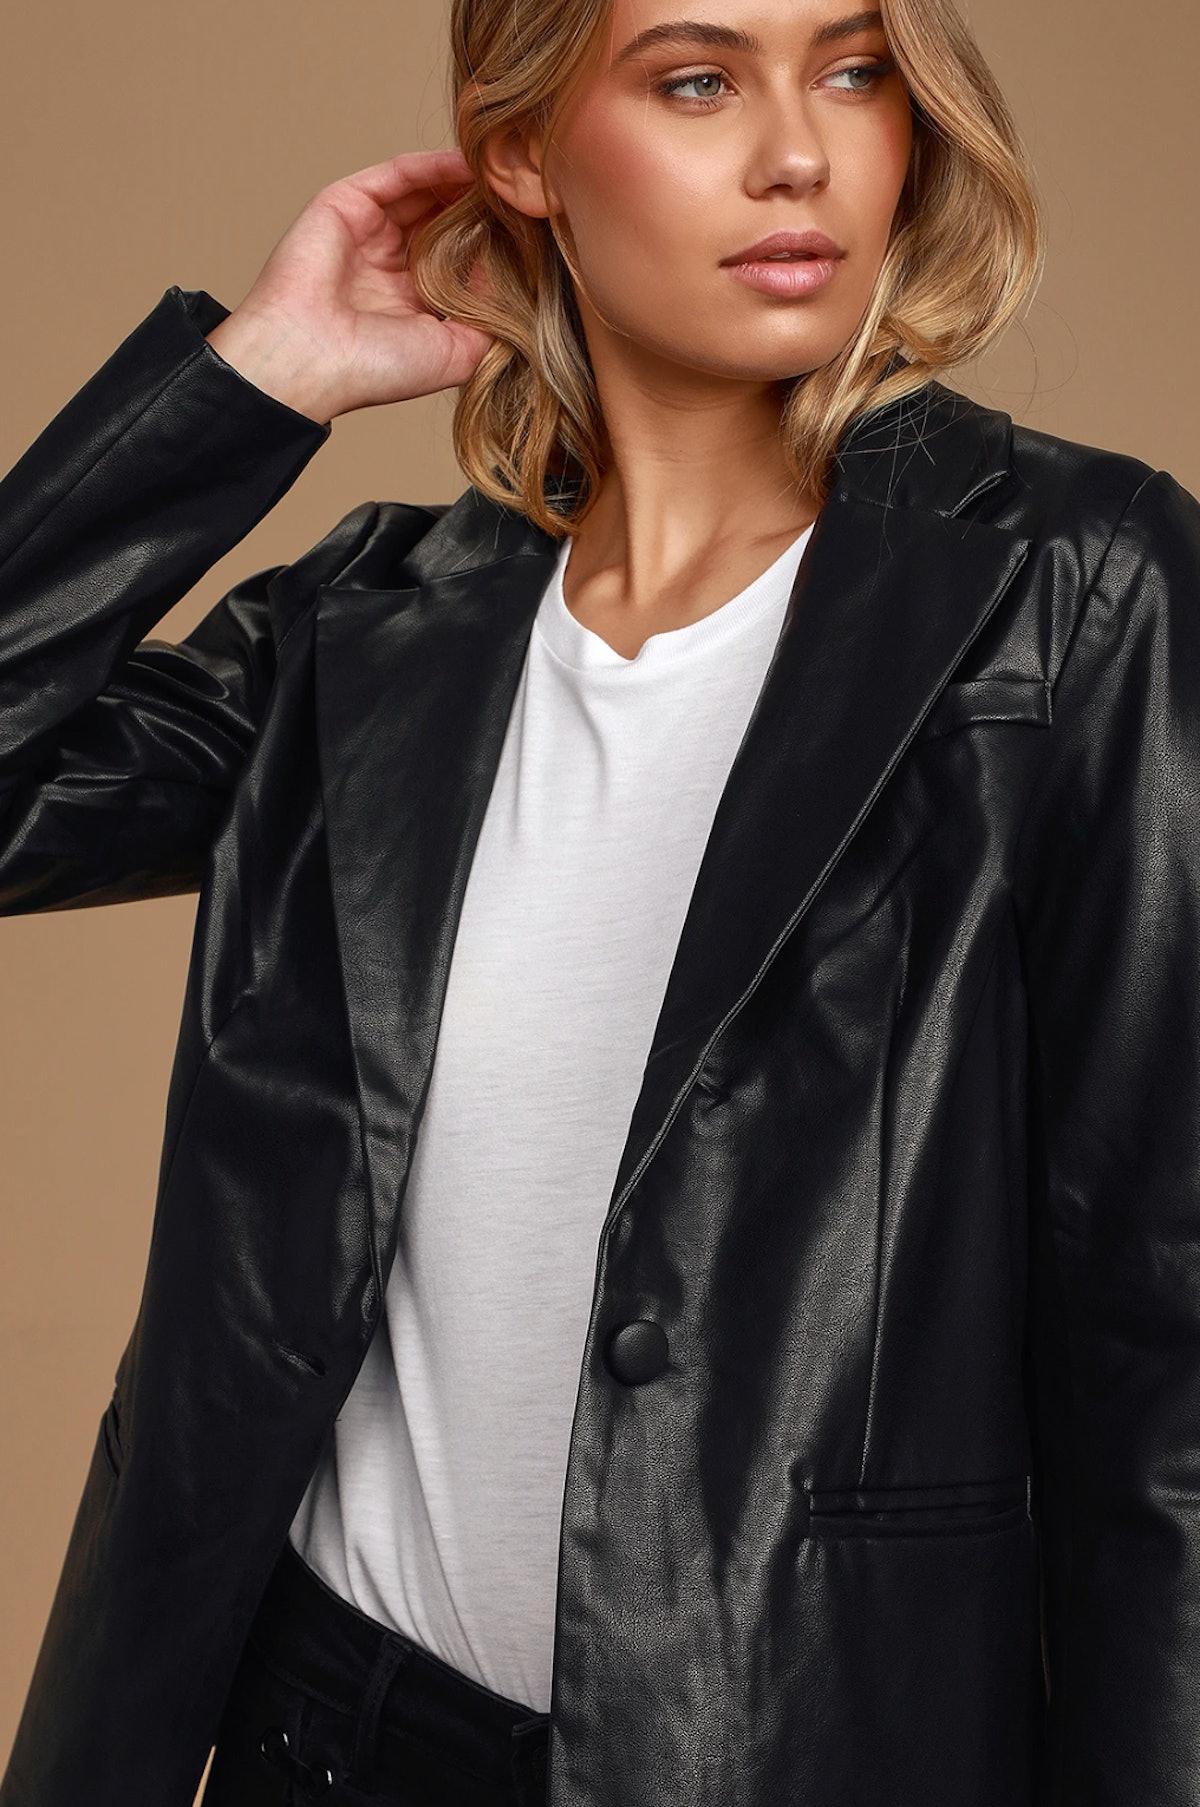 Making Power Moves Black Vegan Leather Blazer